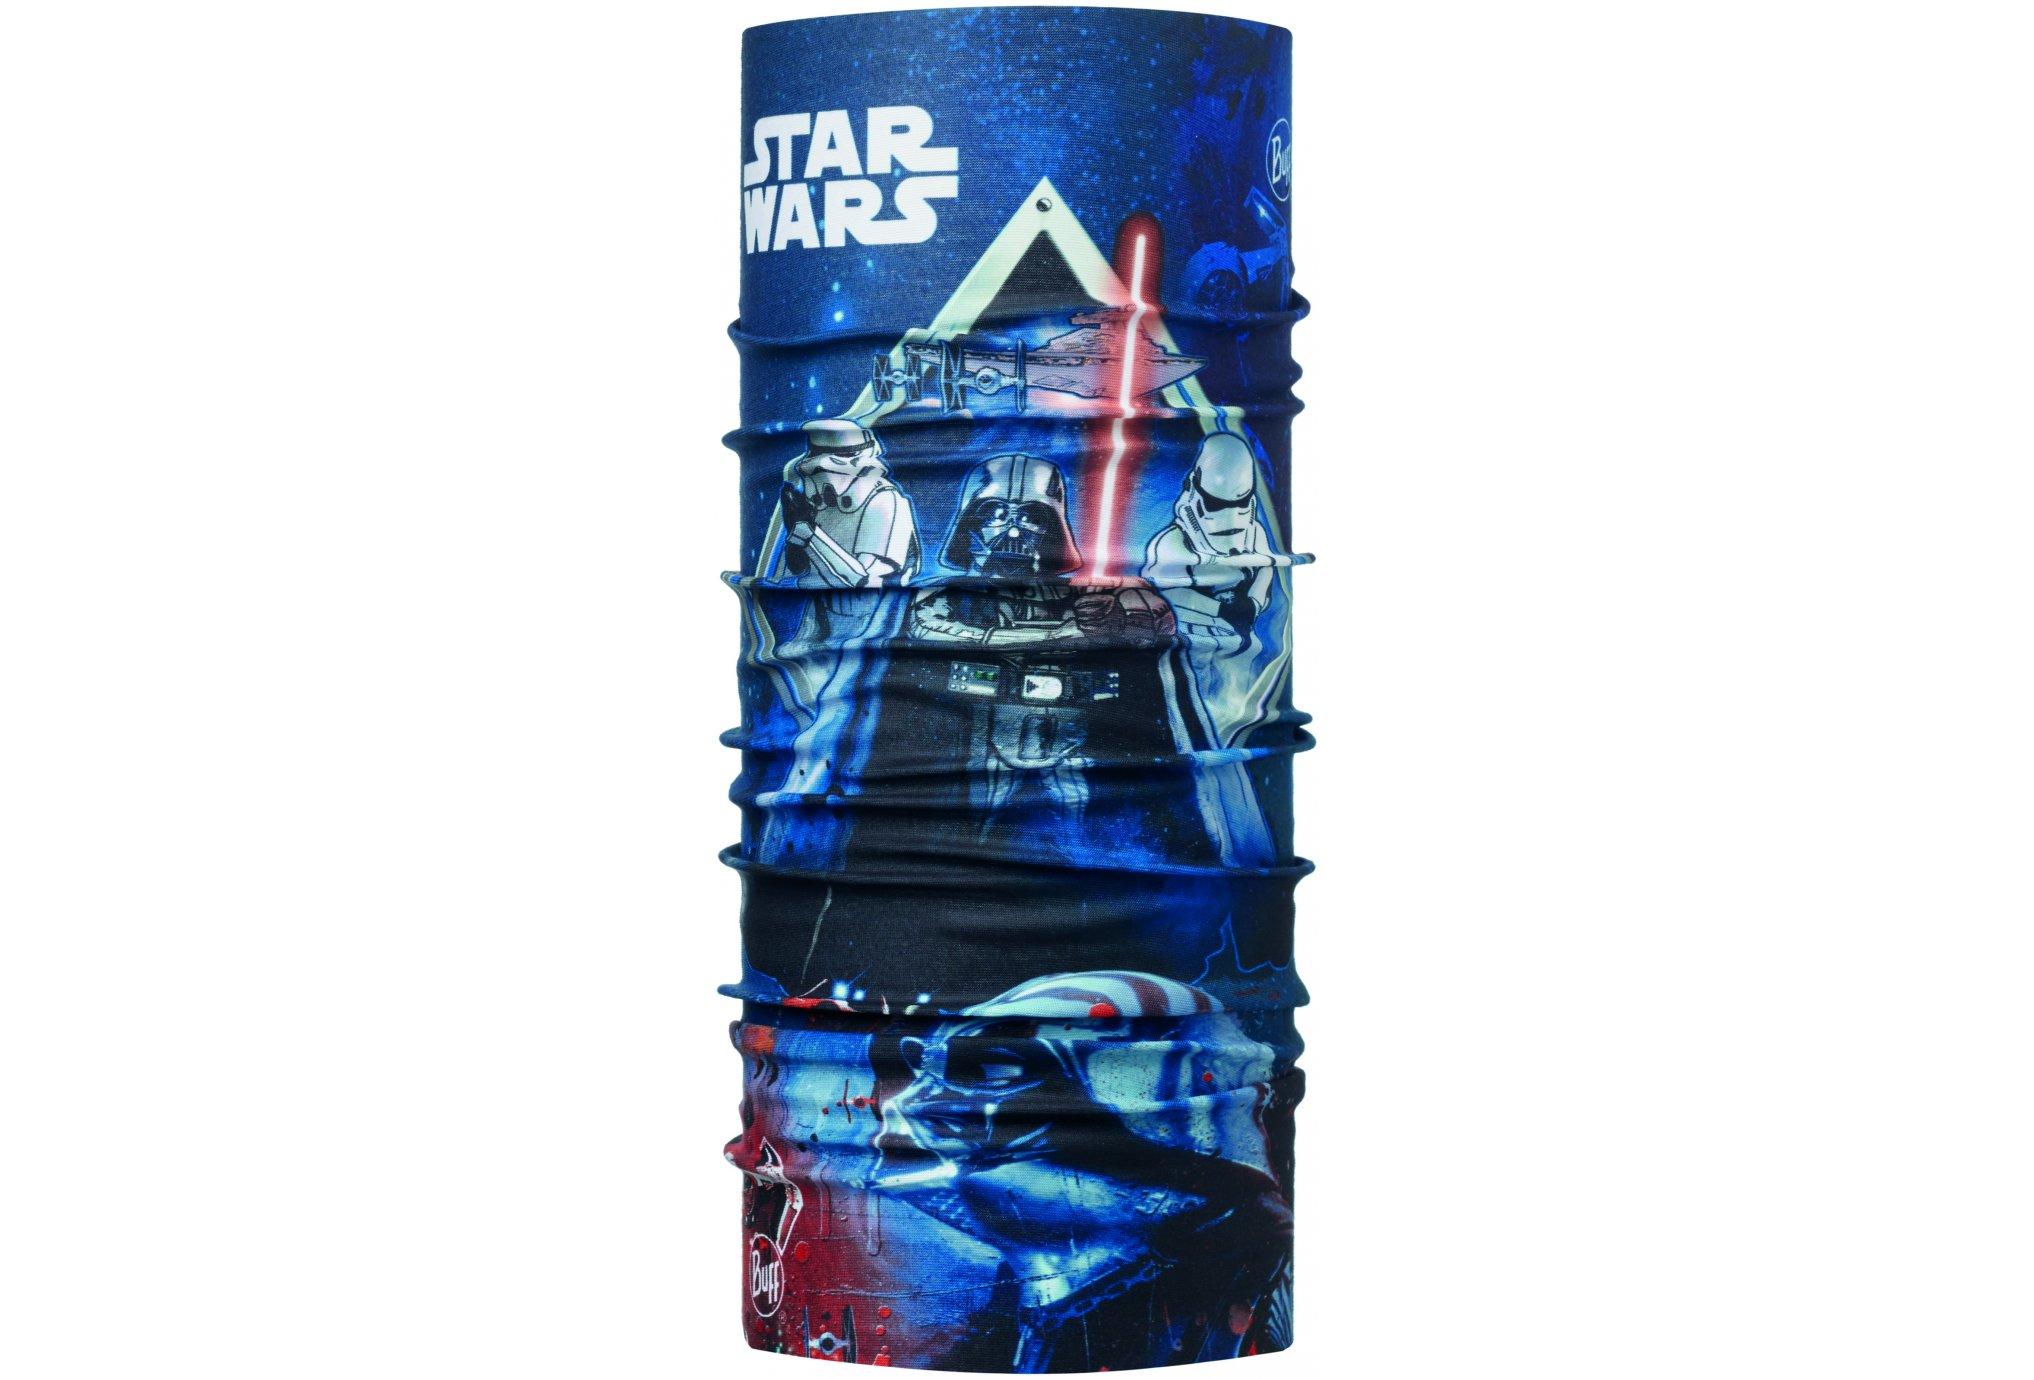 Buff Original Star Wars Light Saber Multi Tours de cou